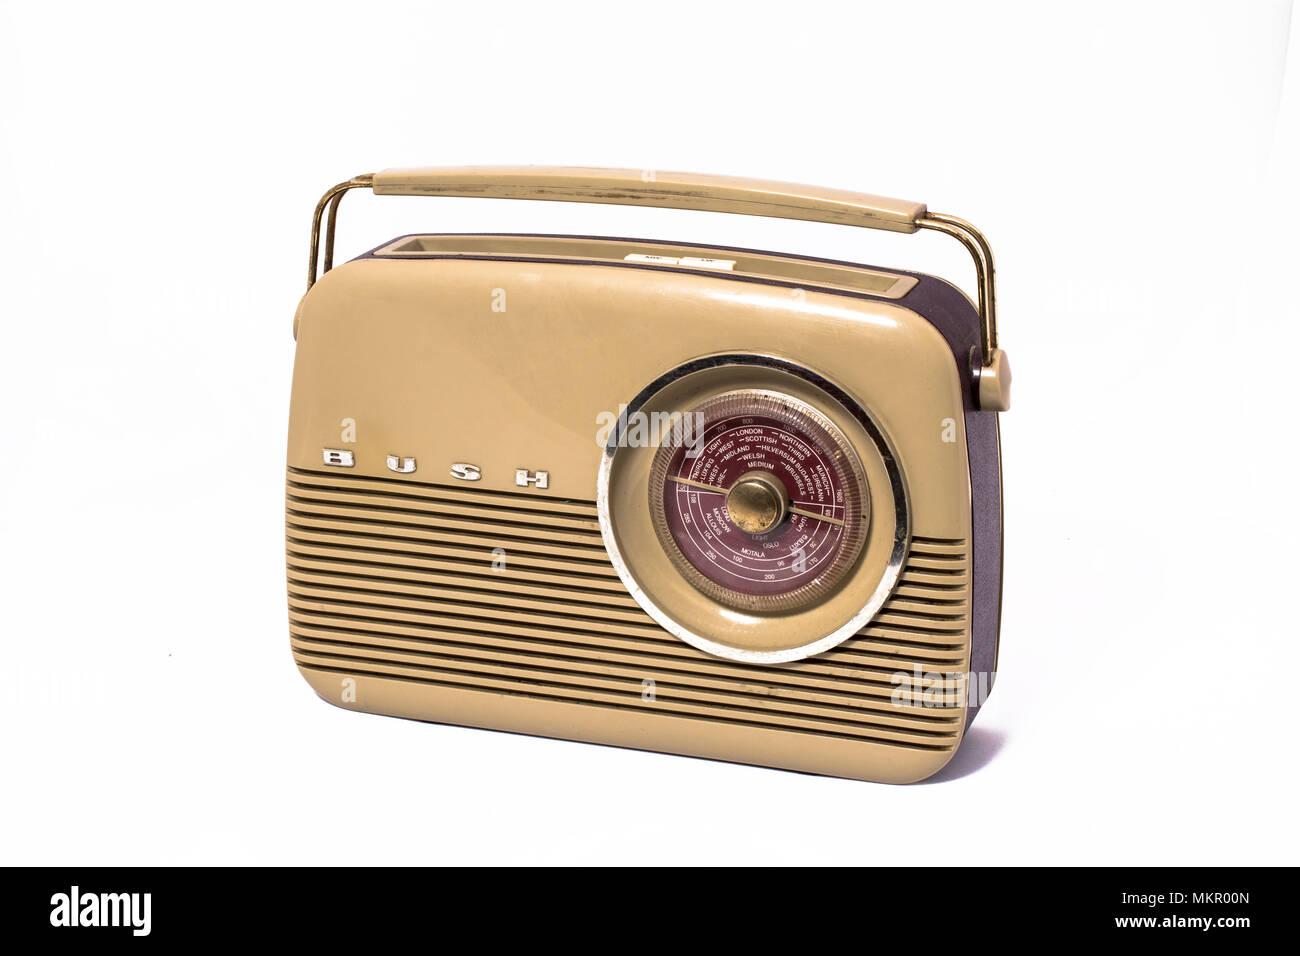 A nineteen sixties Bush portable transistor radio - Stock Image